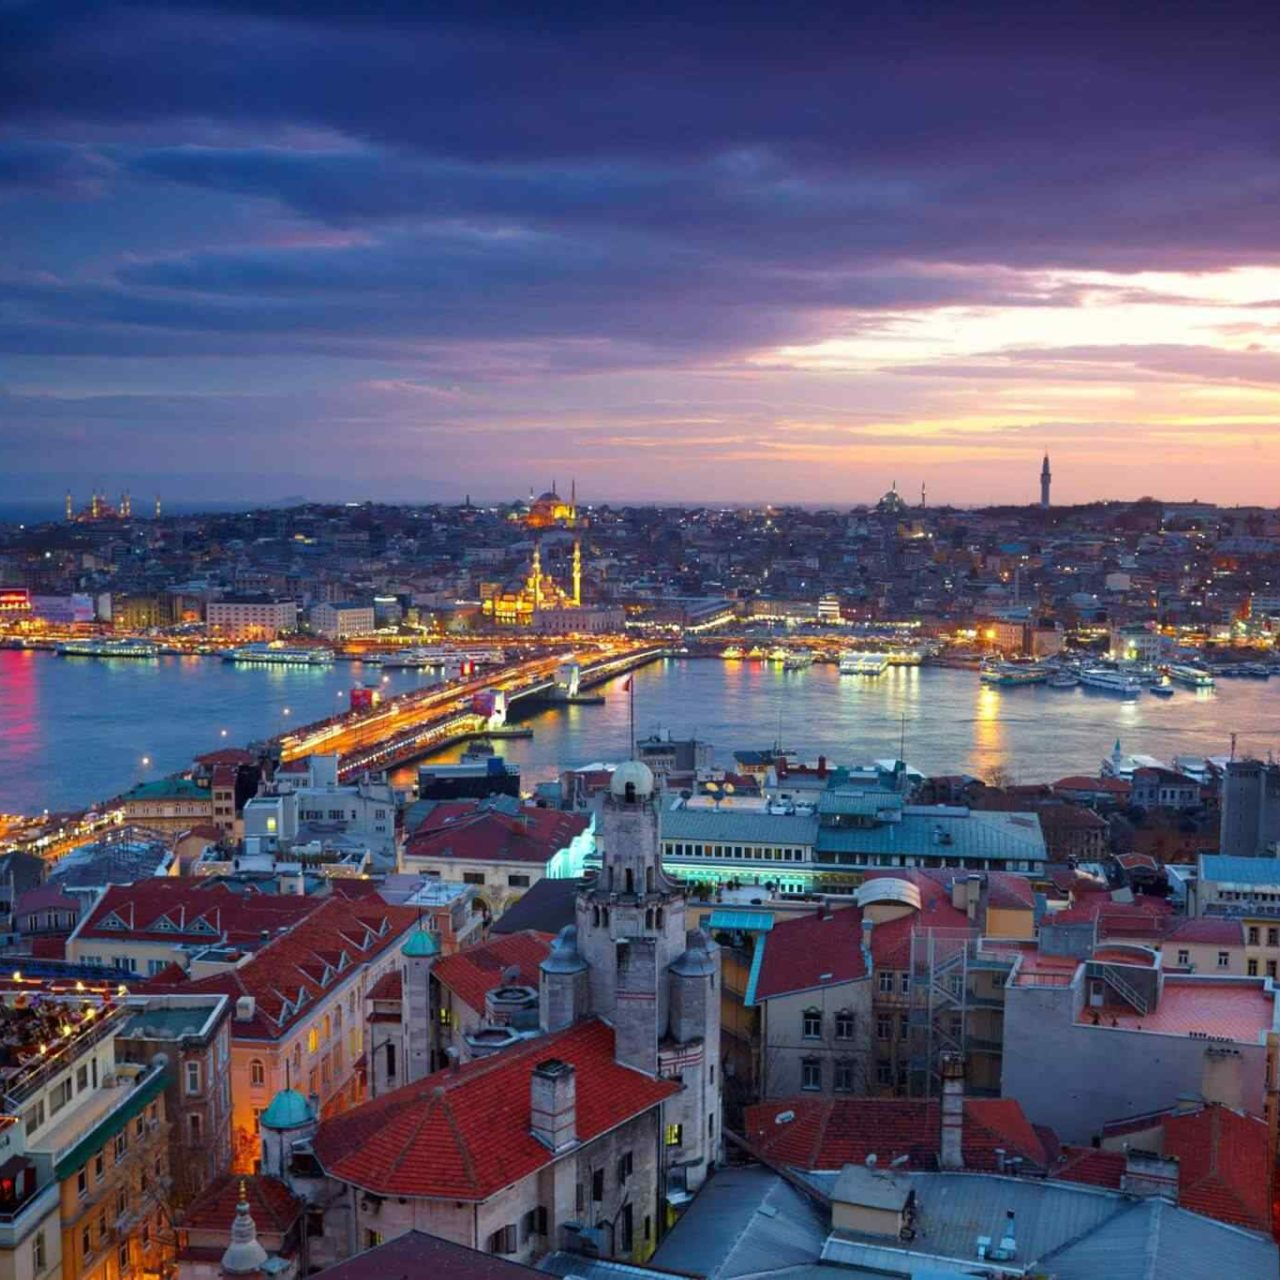 https://classictourbg.com/wp-content/uploads/2018/09/destination-istanbul-01-1280x1280.jpg